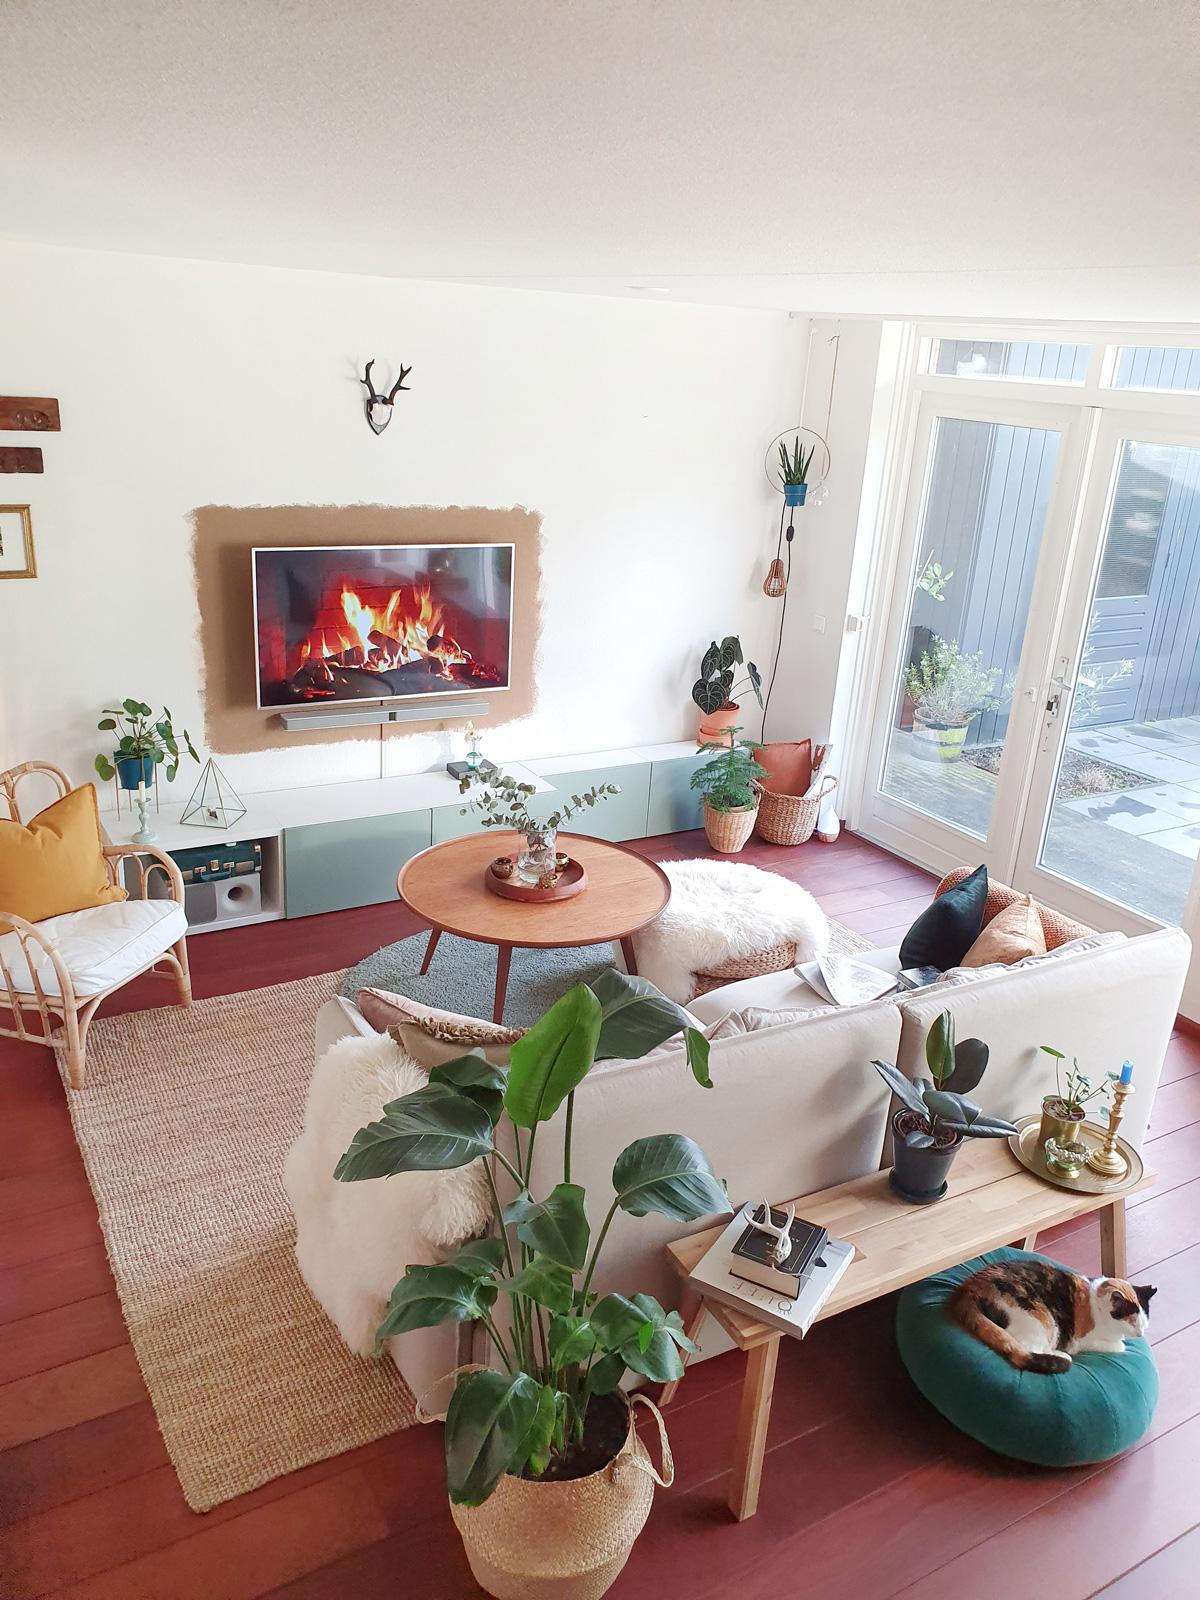 dr.house_bykylie binnenkijken woonkamer livingroom planten rotan bohemian